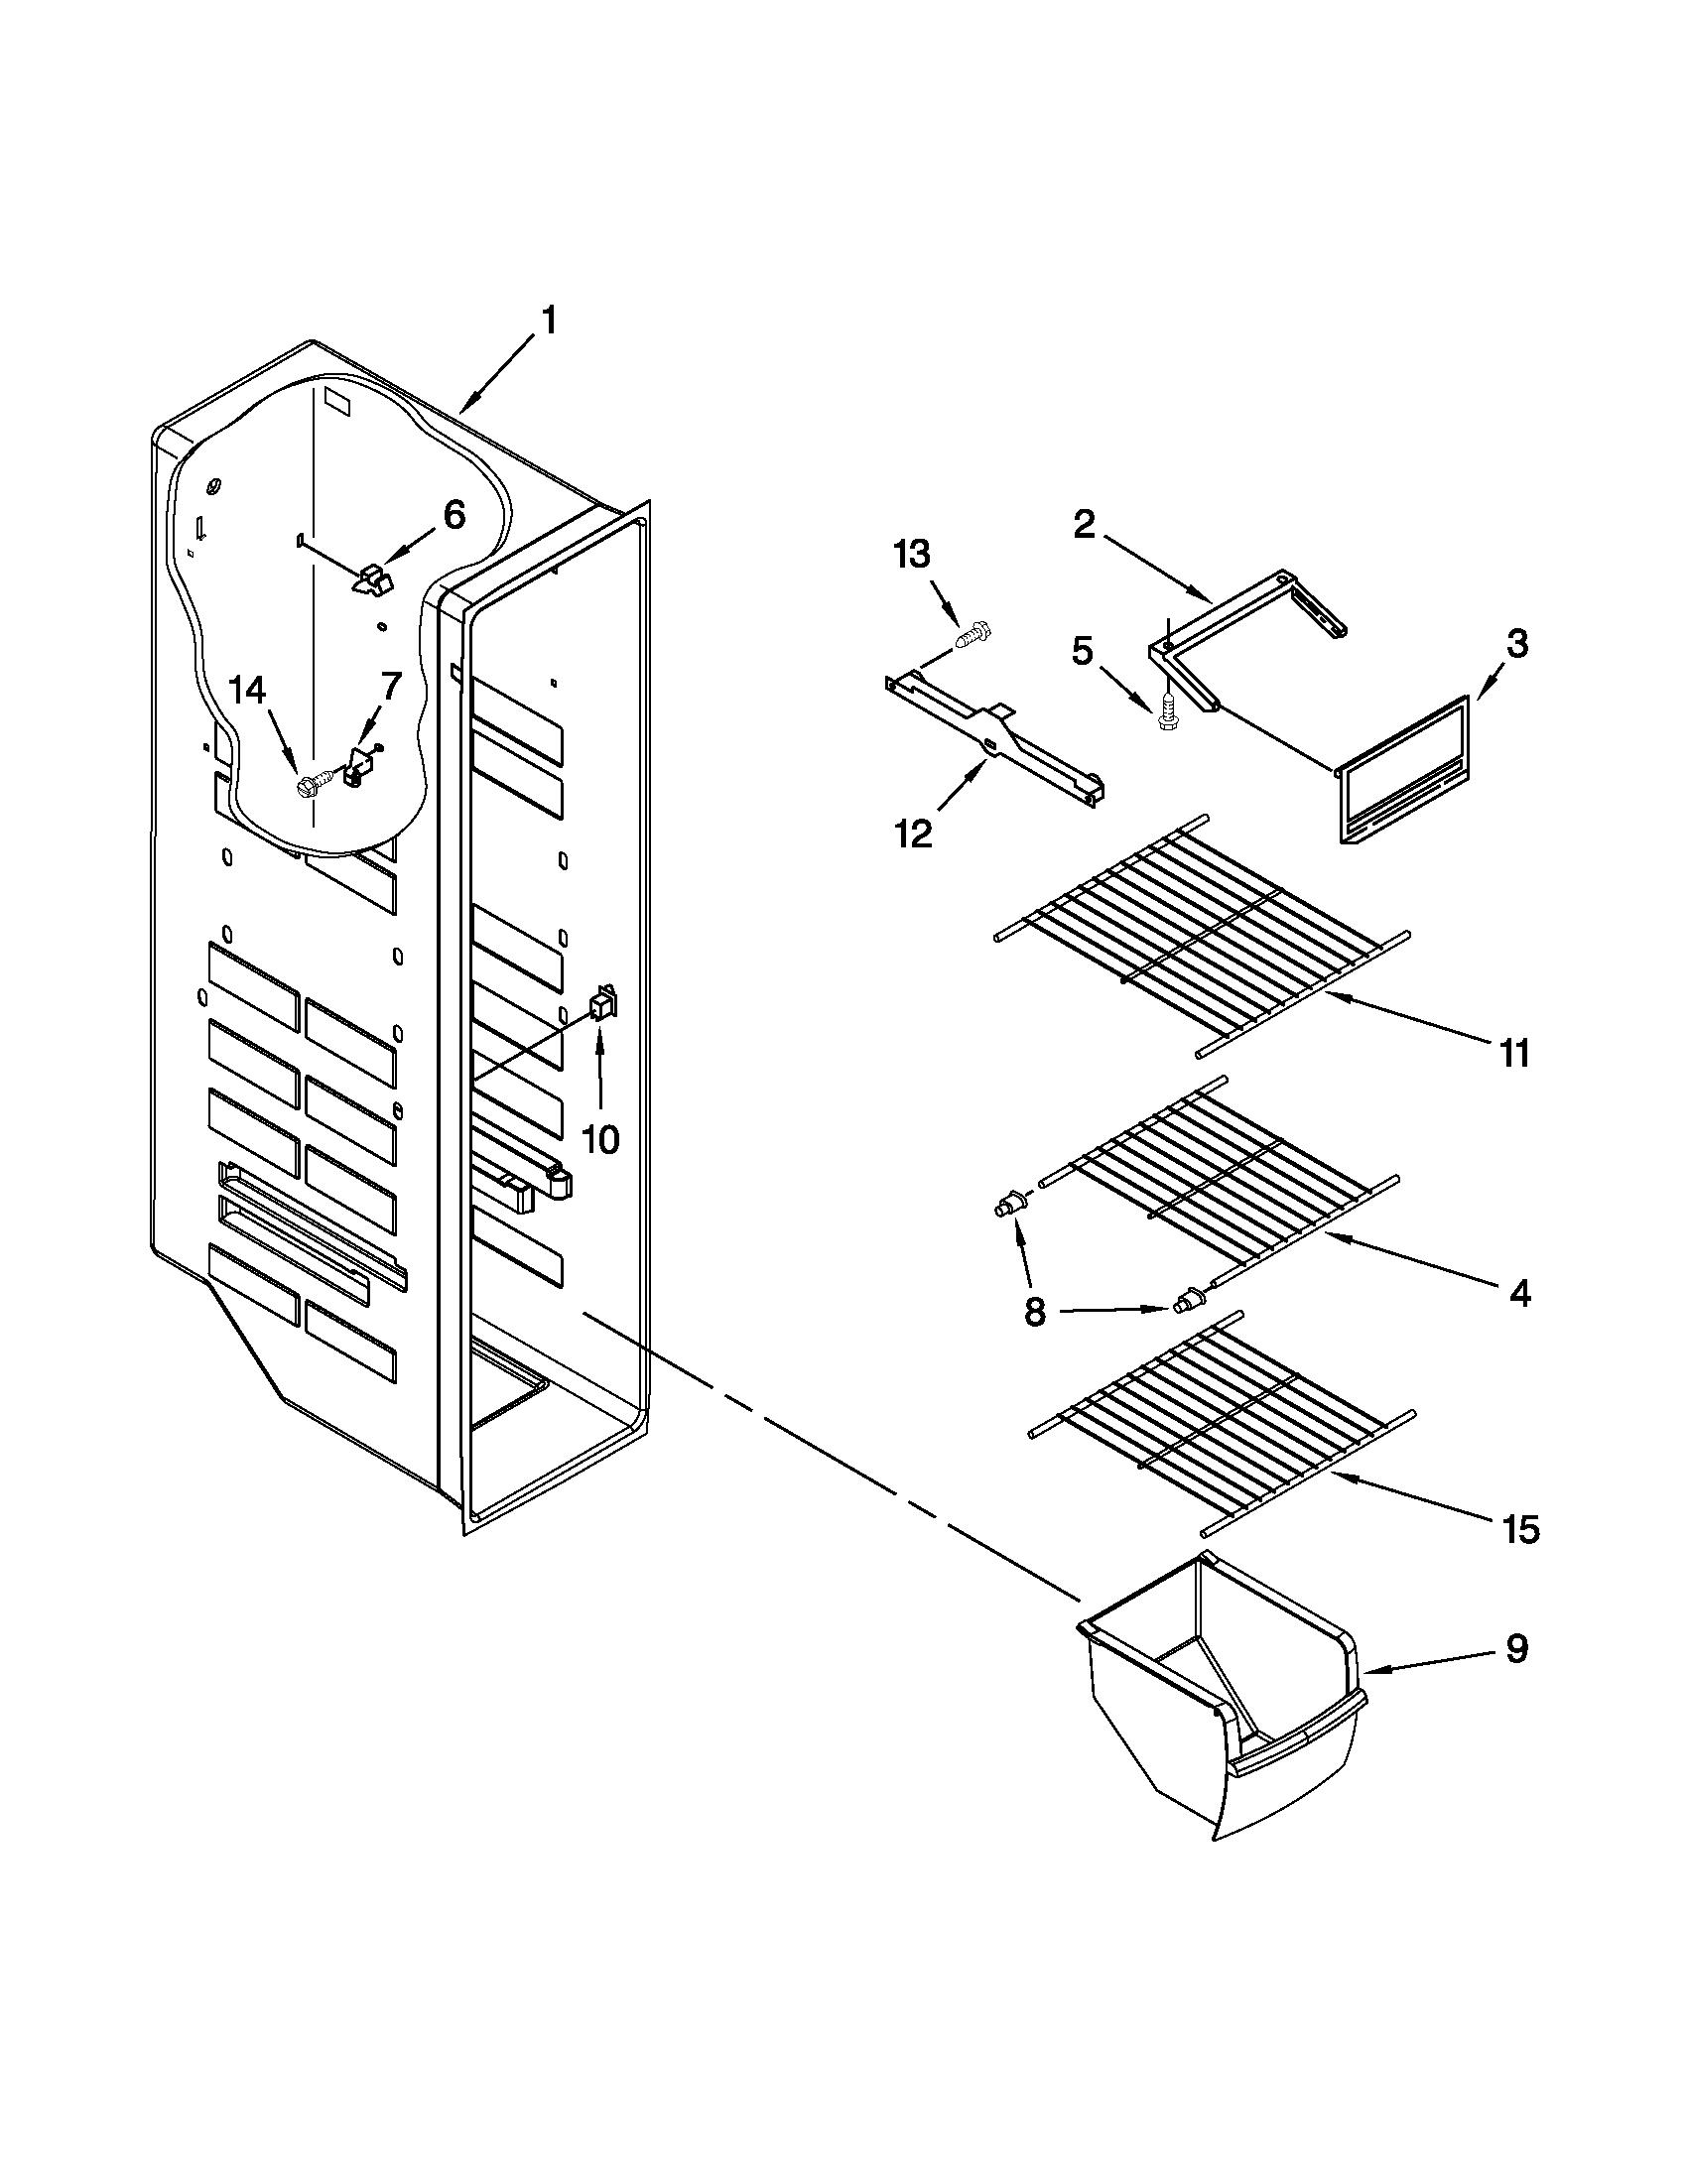 Whirlpool model ED2VHEXVB01 side-by-side refrigerator